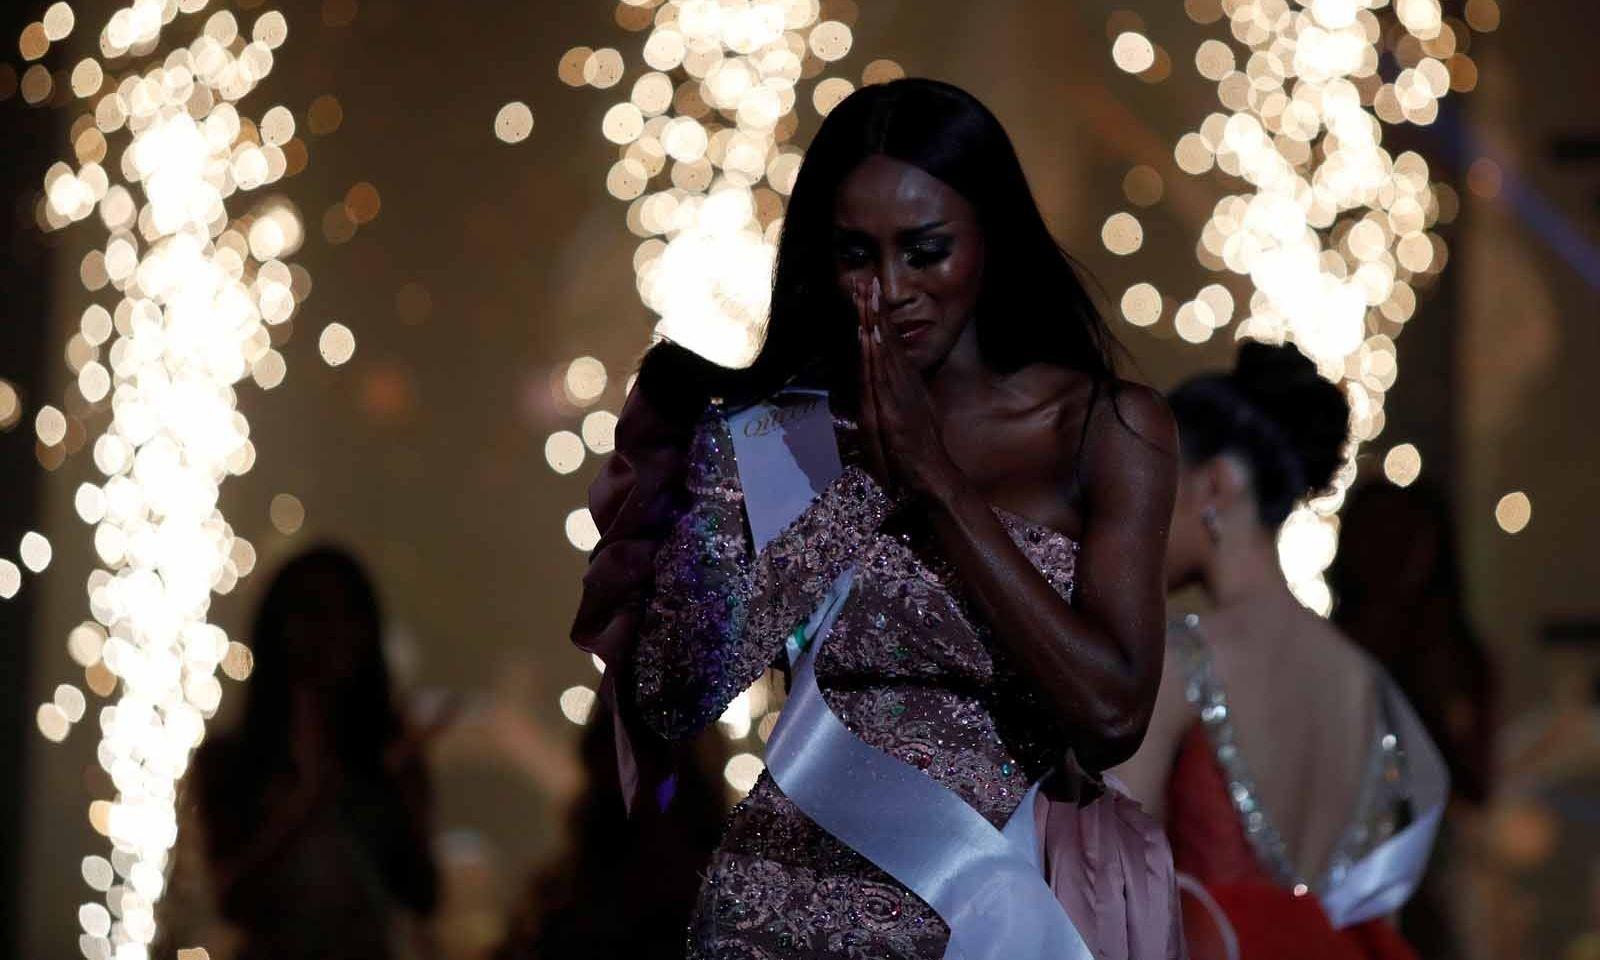 Miss International Queen 2019 transgender beauty pageant in Pattaya